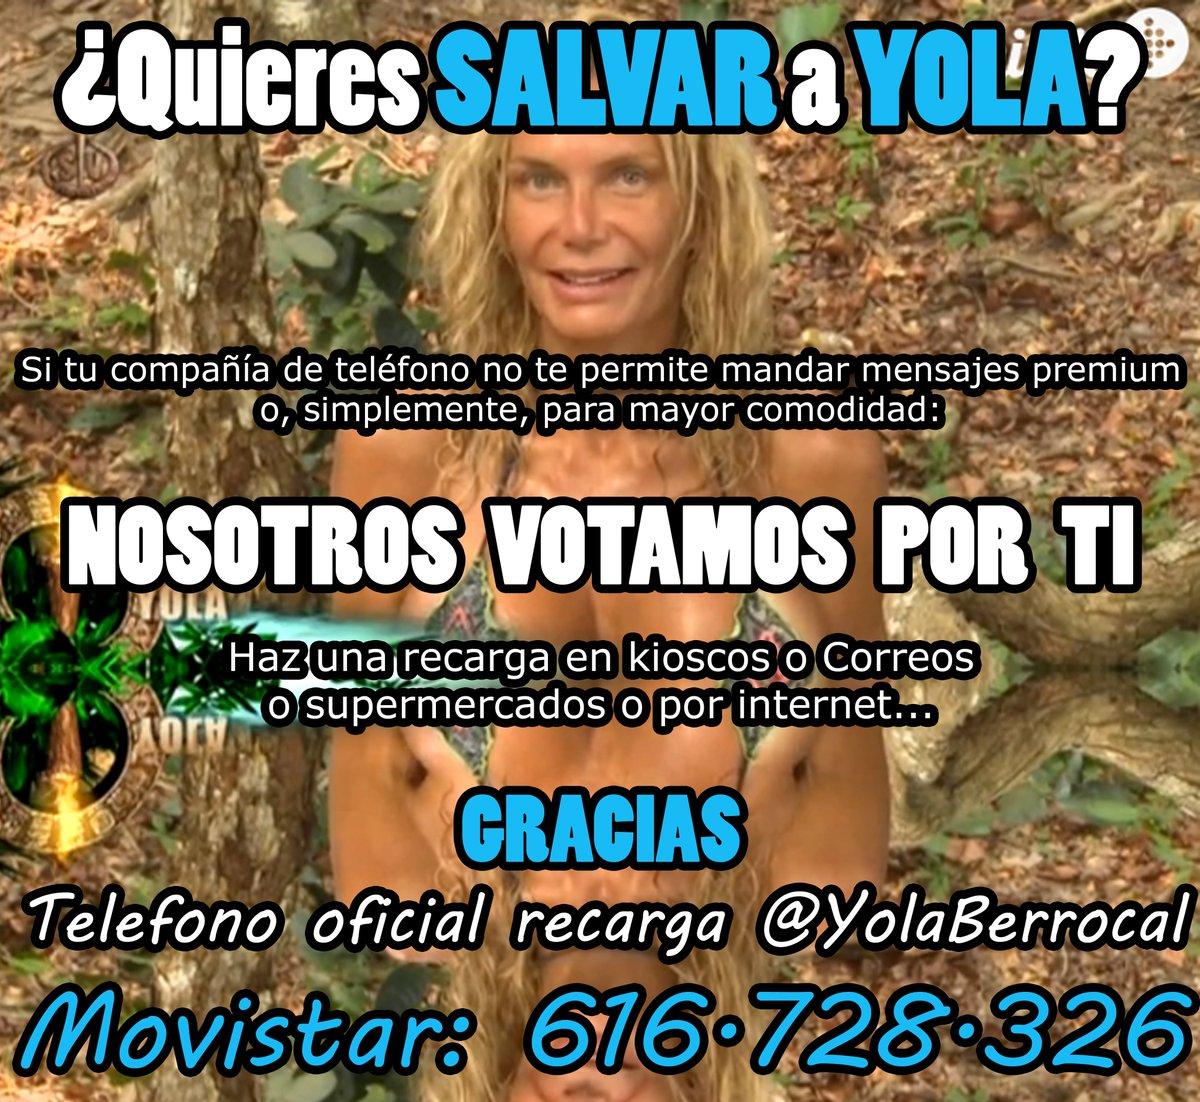 Nº recarga oficial @YolaBerrocal 616728326. Nosotros votamos por ti. Pago online: https://t.co/tuCvESnT7x #TeamYola https://t.co/Kvkyha6N20